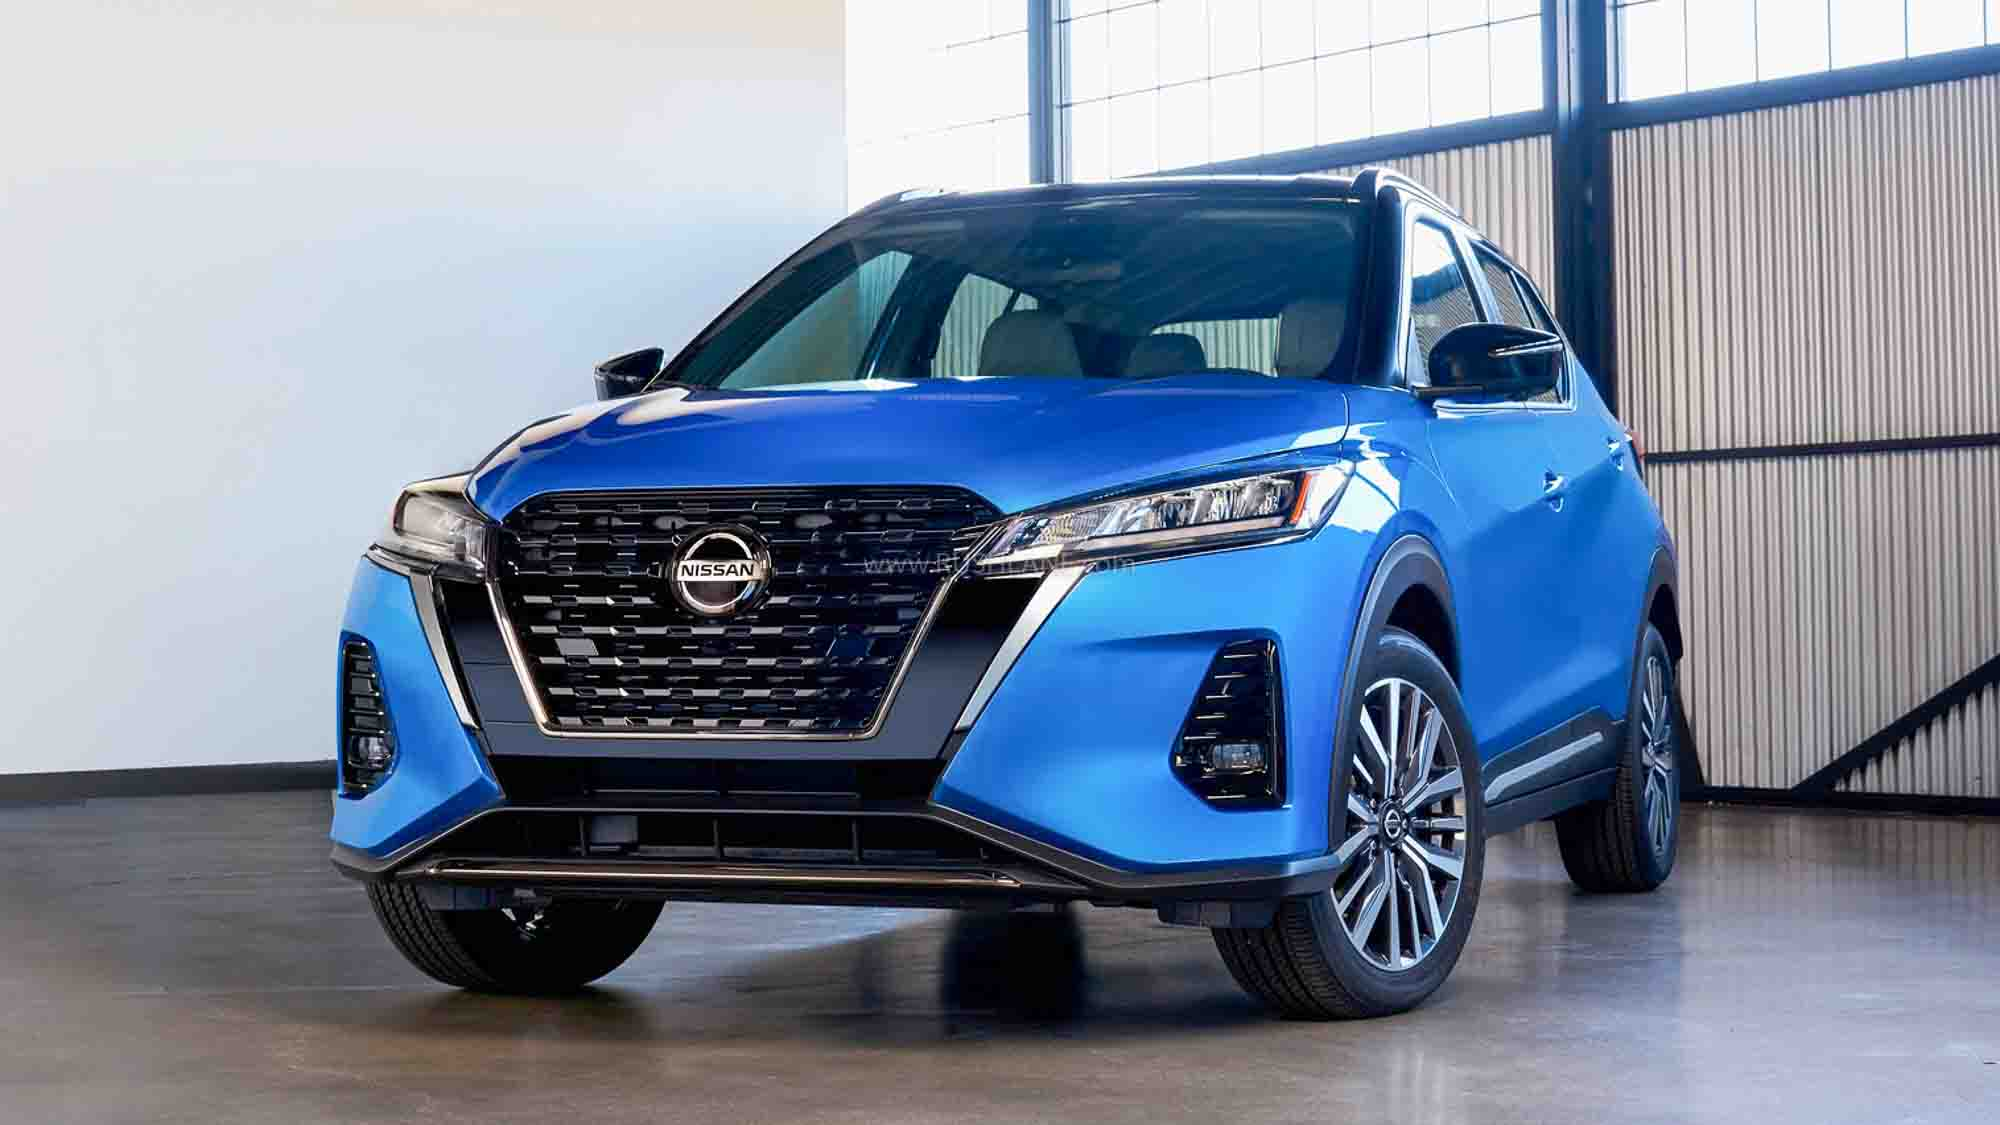 2021 nissan kicks facelift makes us debut - gets new 8